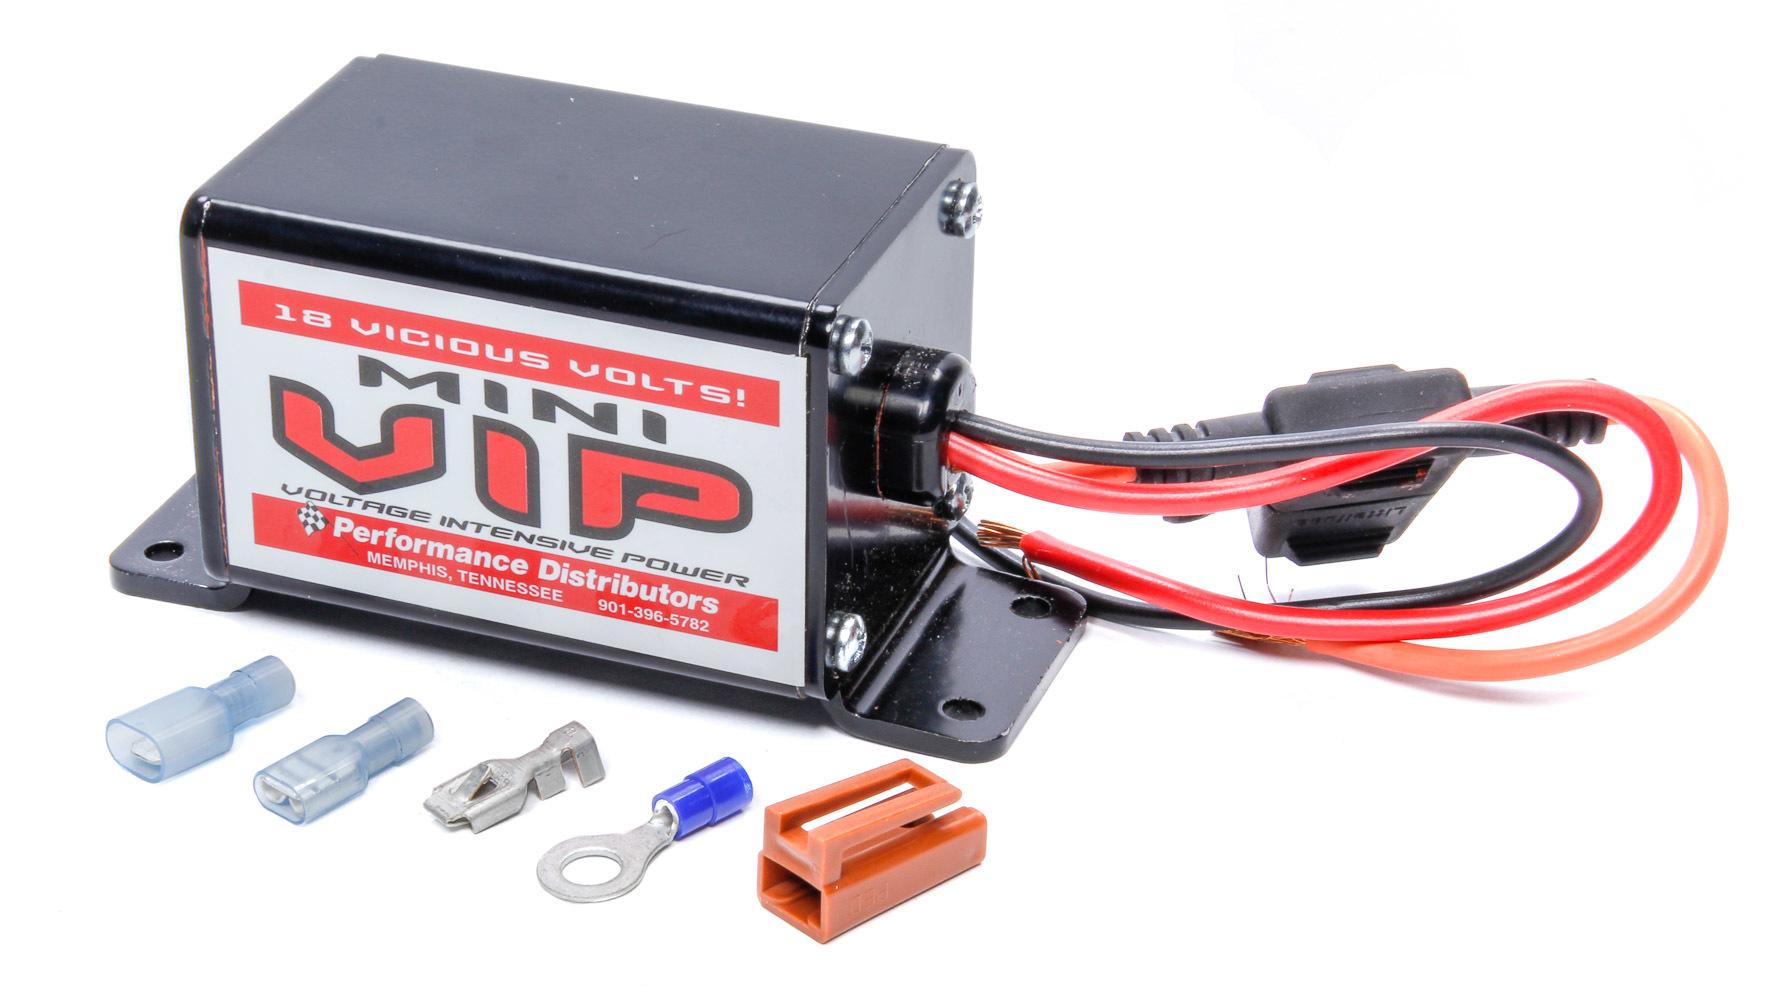 Performance Distributors 5577 Voltage Regulator, Mini VIP, 14V to 18V, Each